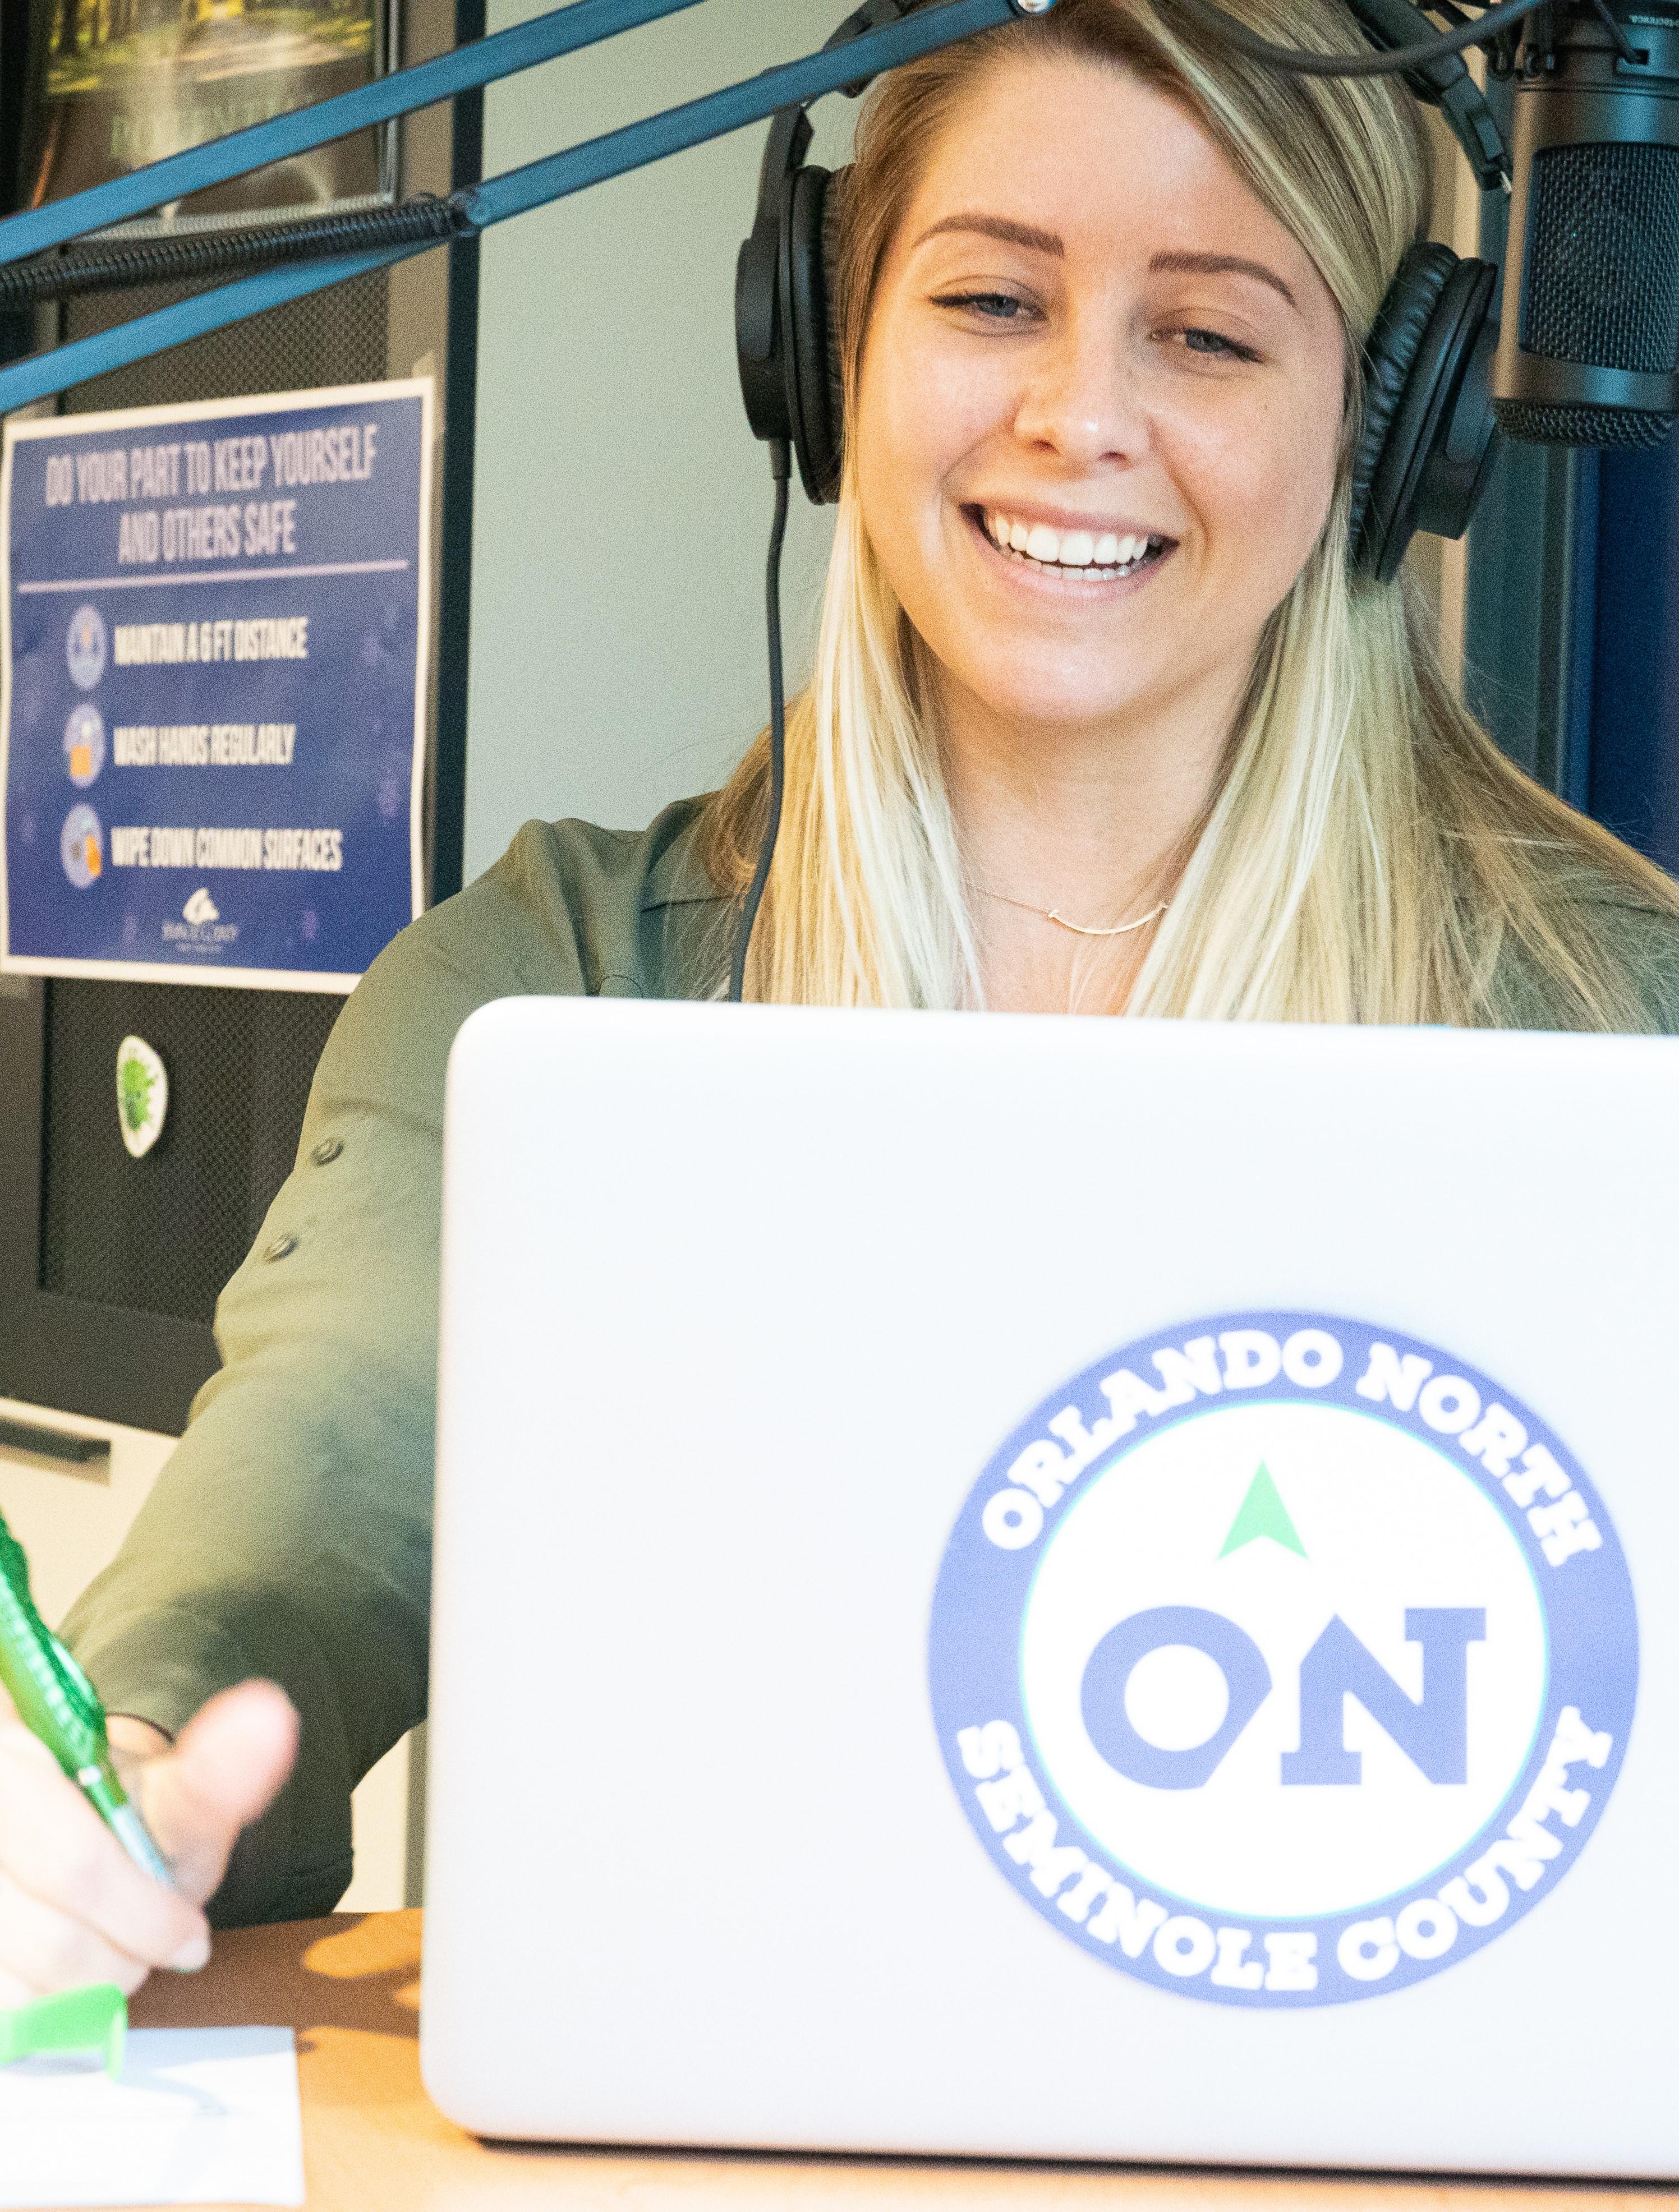 orlando_north_podcast